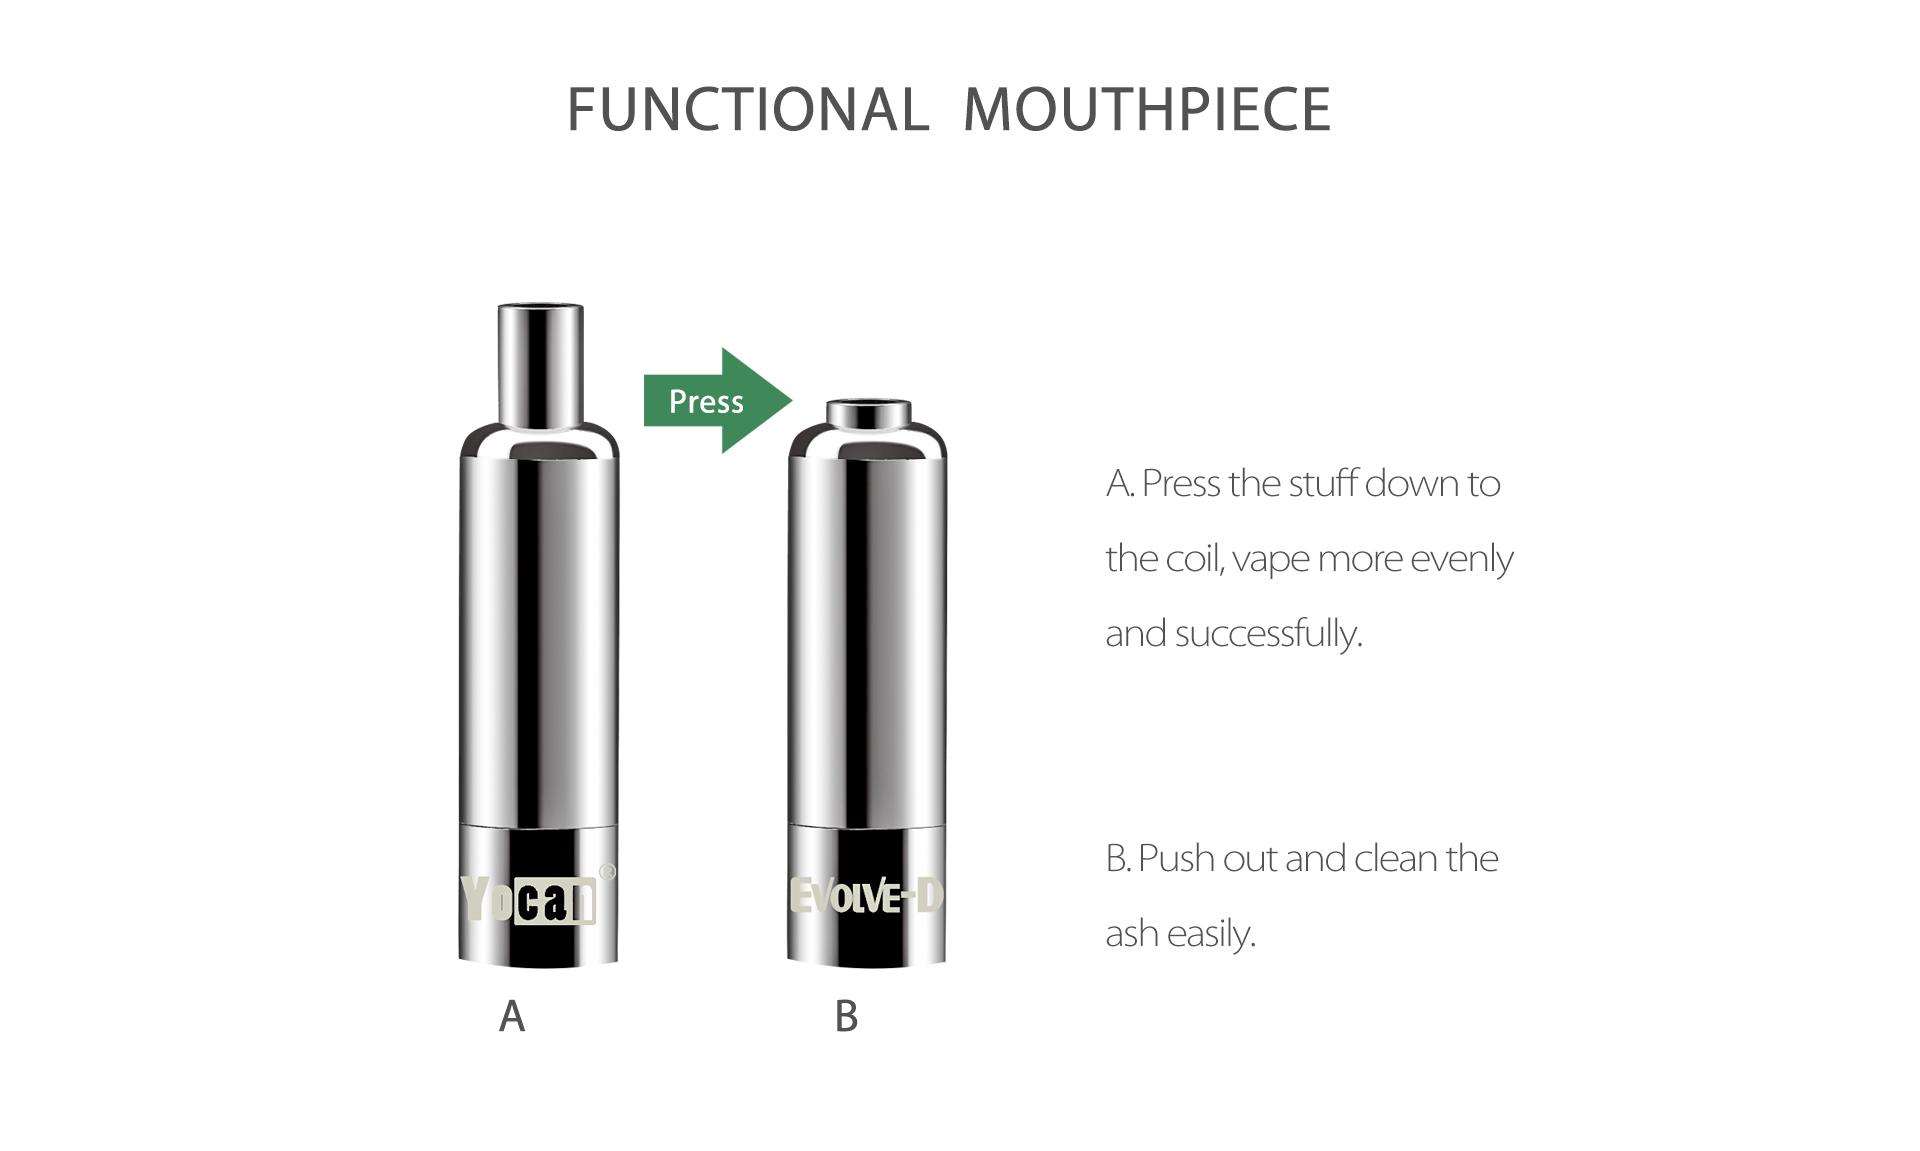 Yocan Evolve-D vaporizer pen 2020 version features functional mouthpiece.